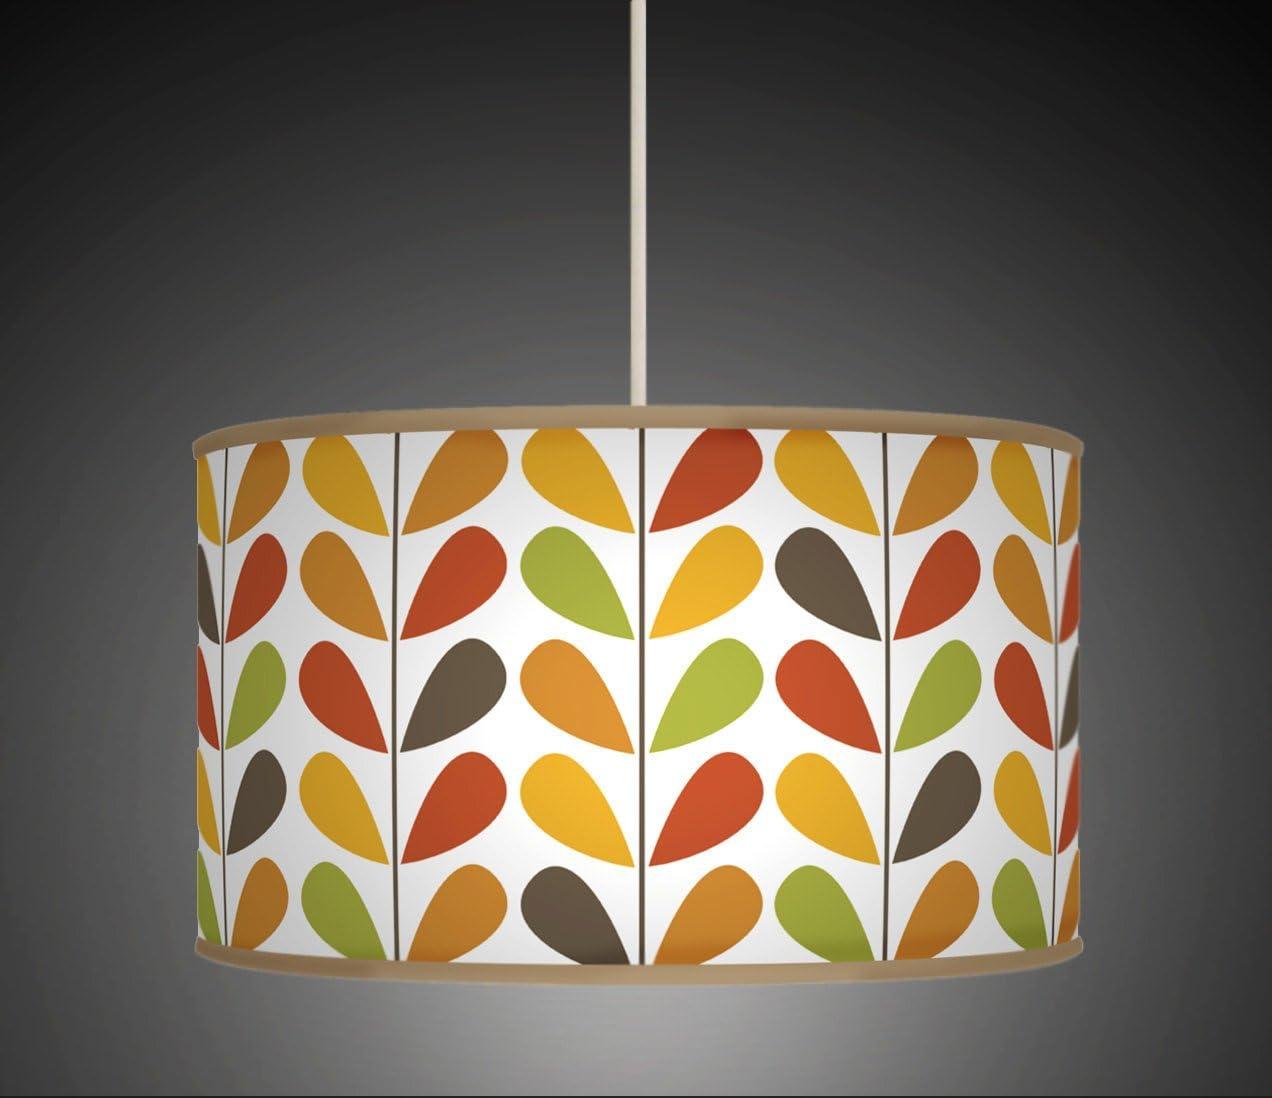 30cm Flower Stem Floral Multi Colour Retro Geometric Handmade Giclee Printed Fabric Lamp Drum Lampshade Floor Ceiling Pendant Light Shade 608